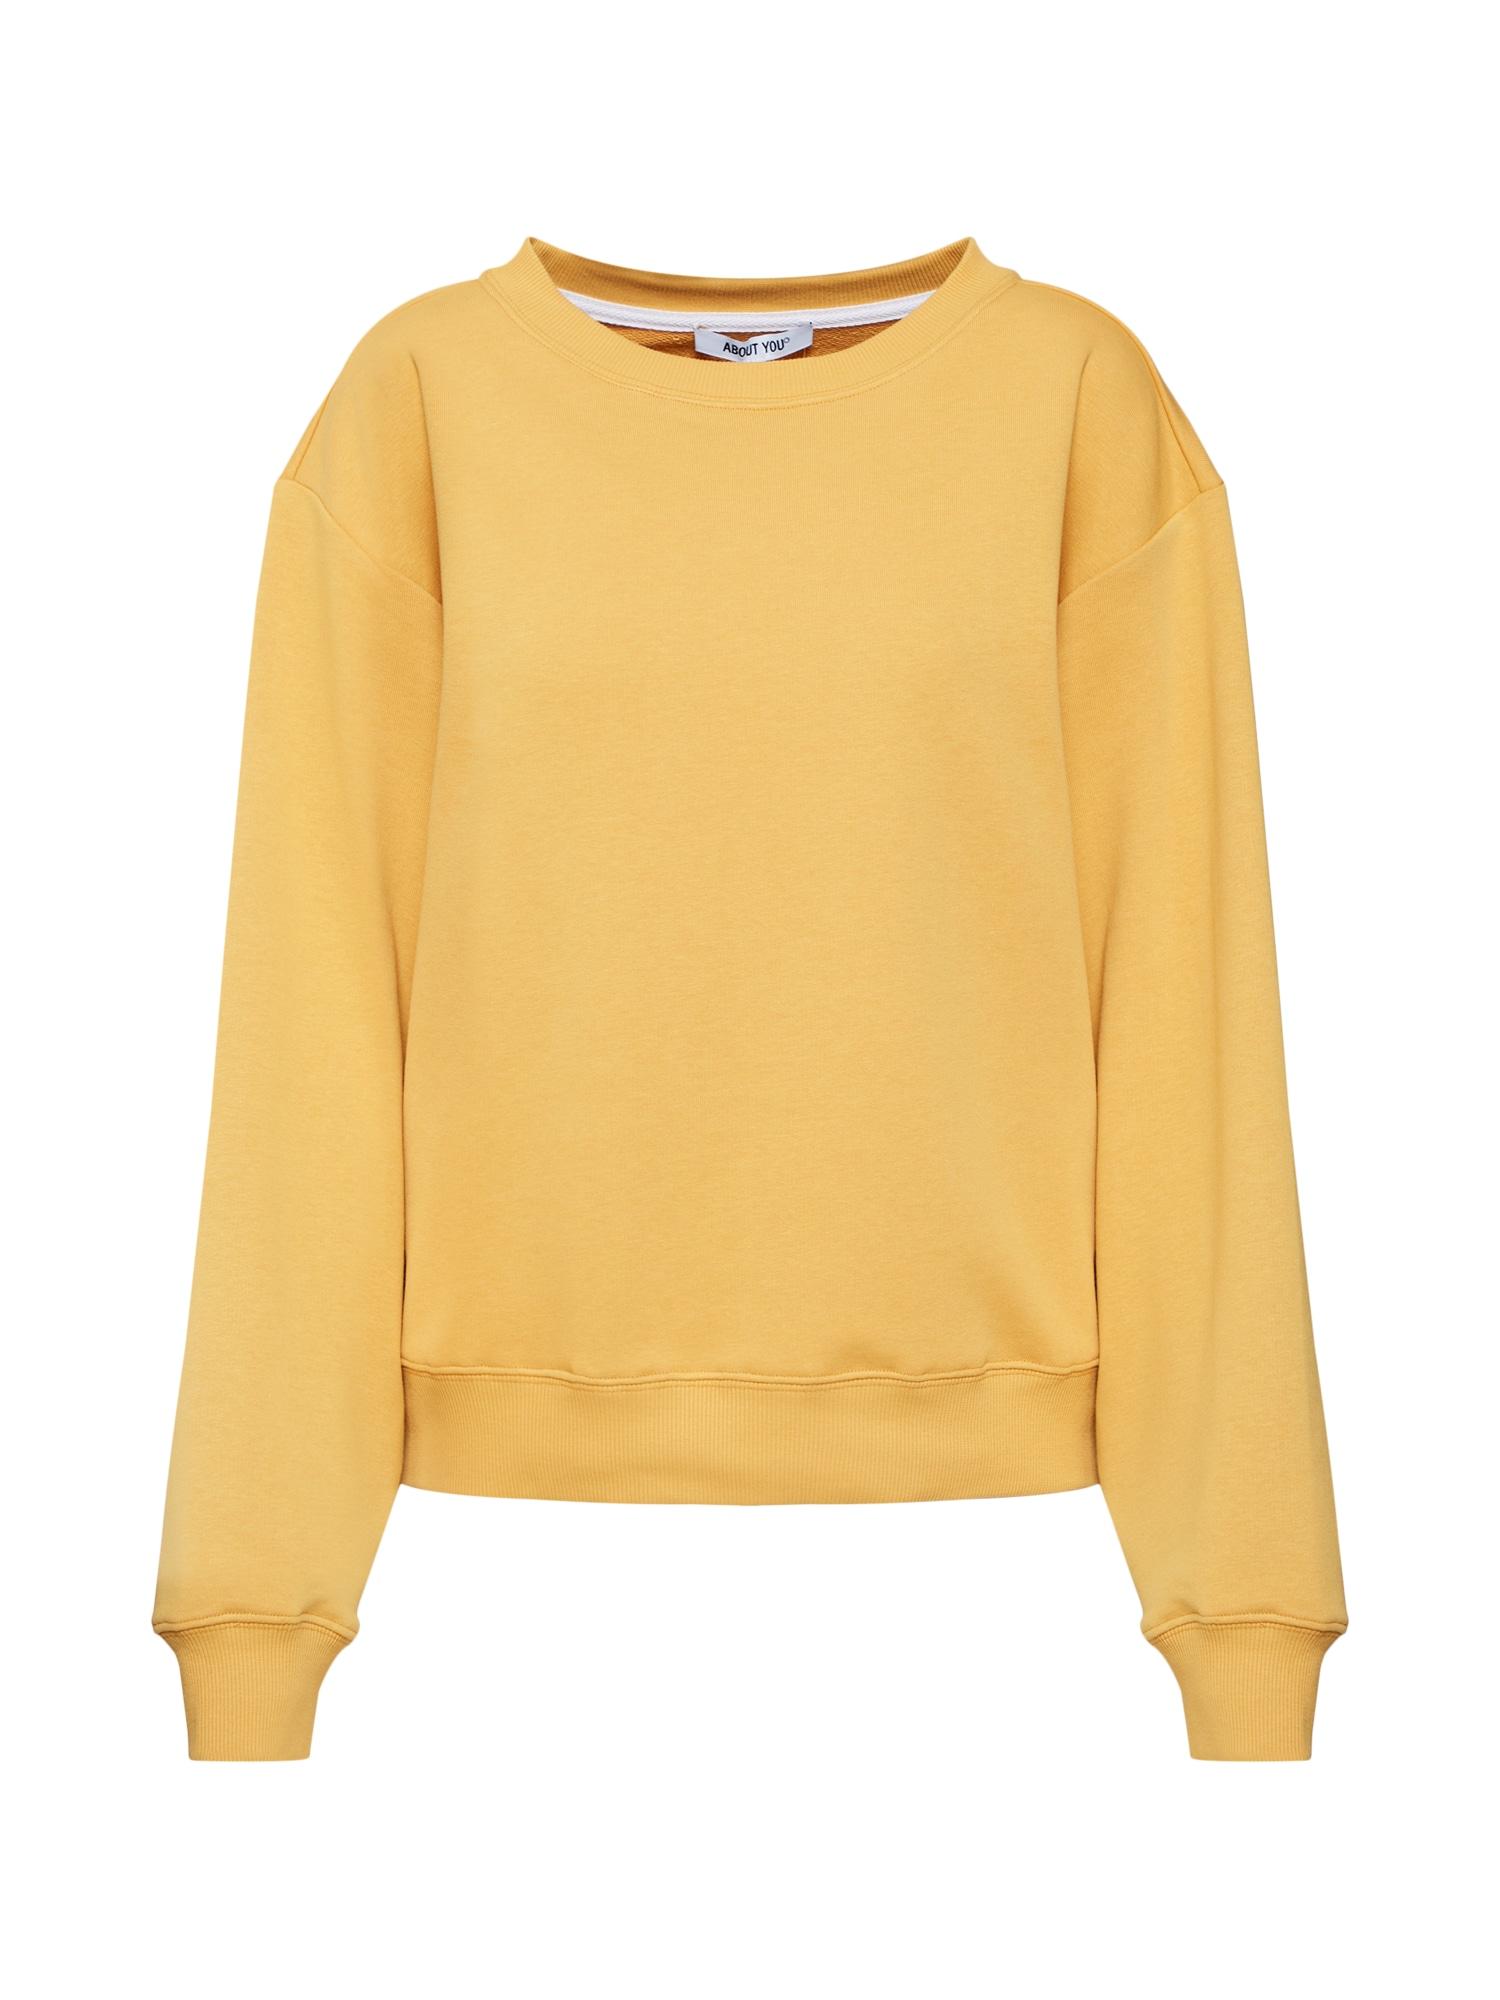 ABOUT YOU, Dames Sweatshirt 'Emma', geel